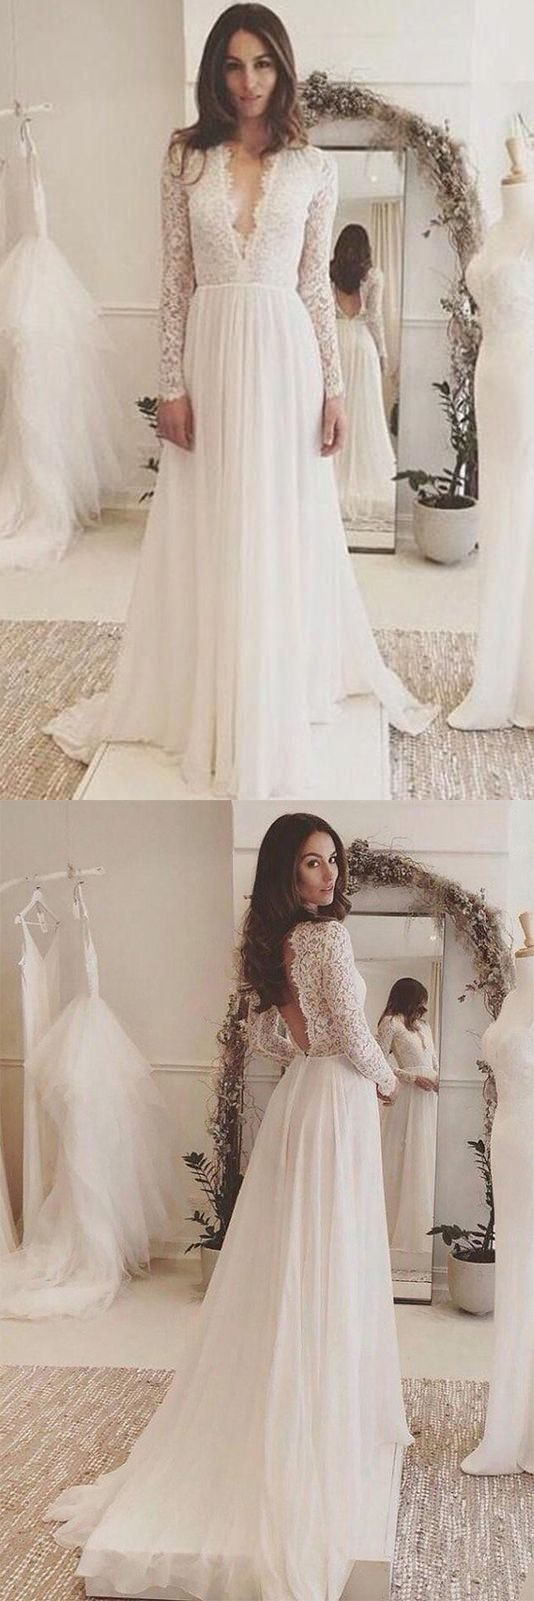 Elegant white wedding dresschiffon long sleeves bridal dresslace